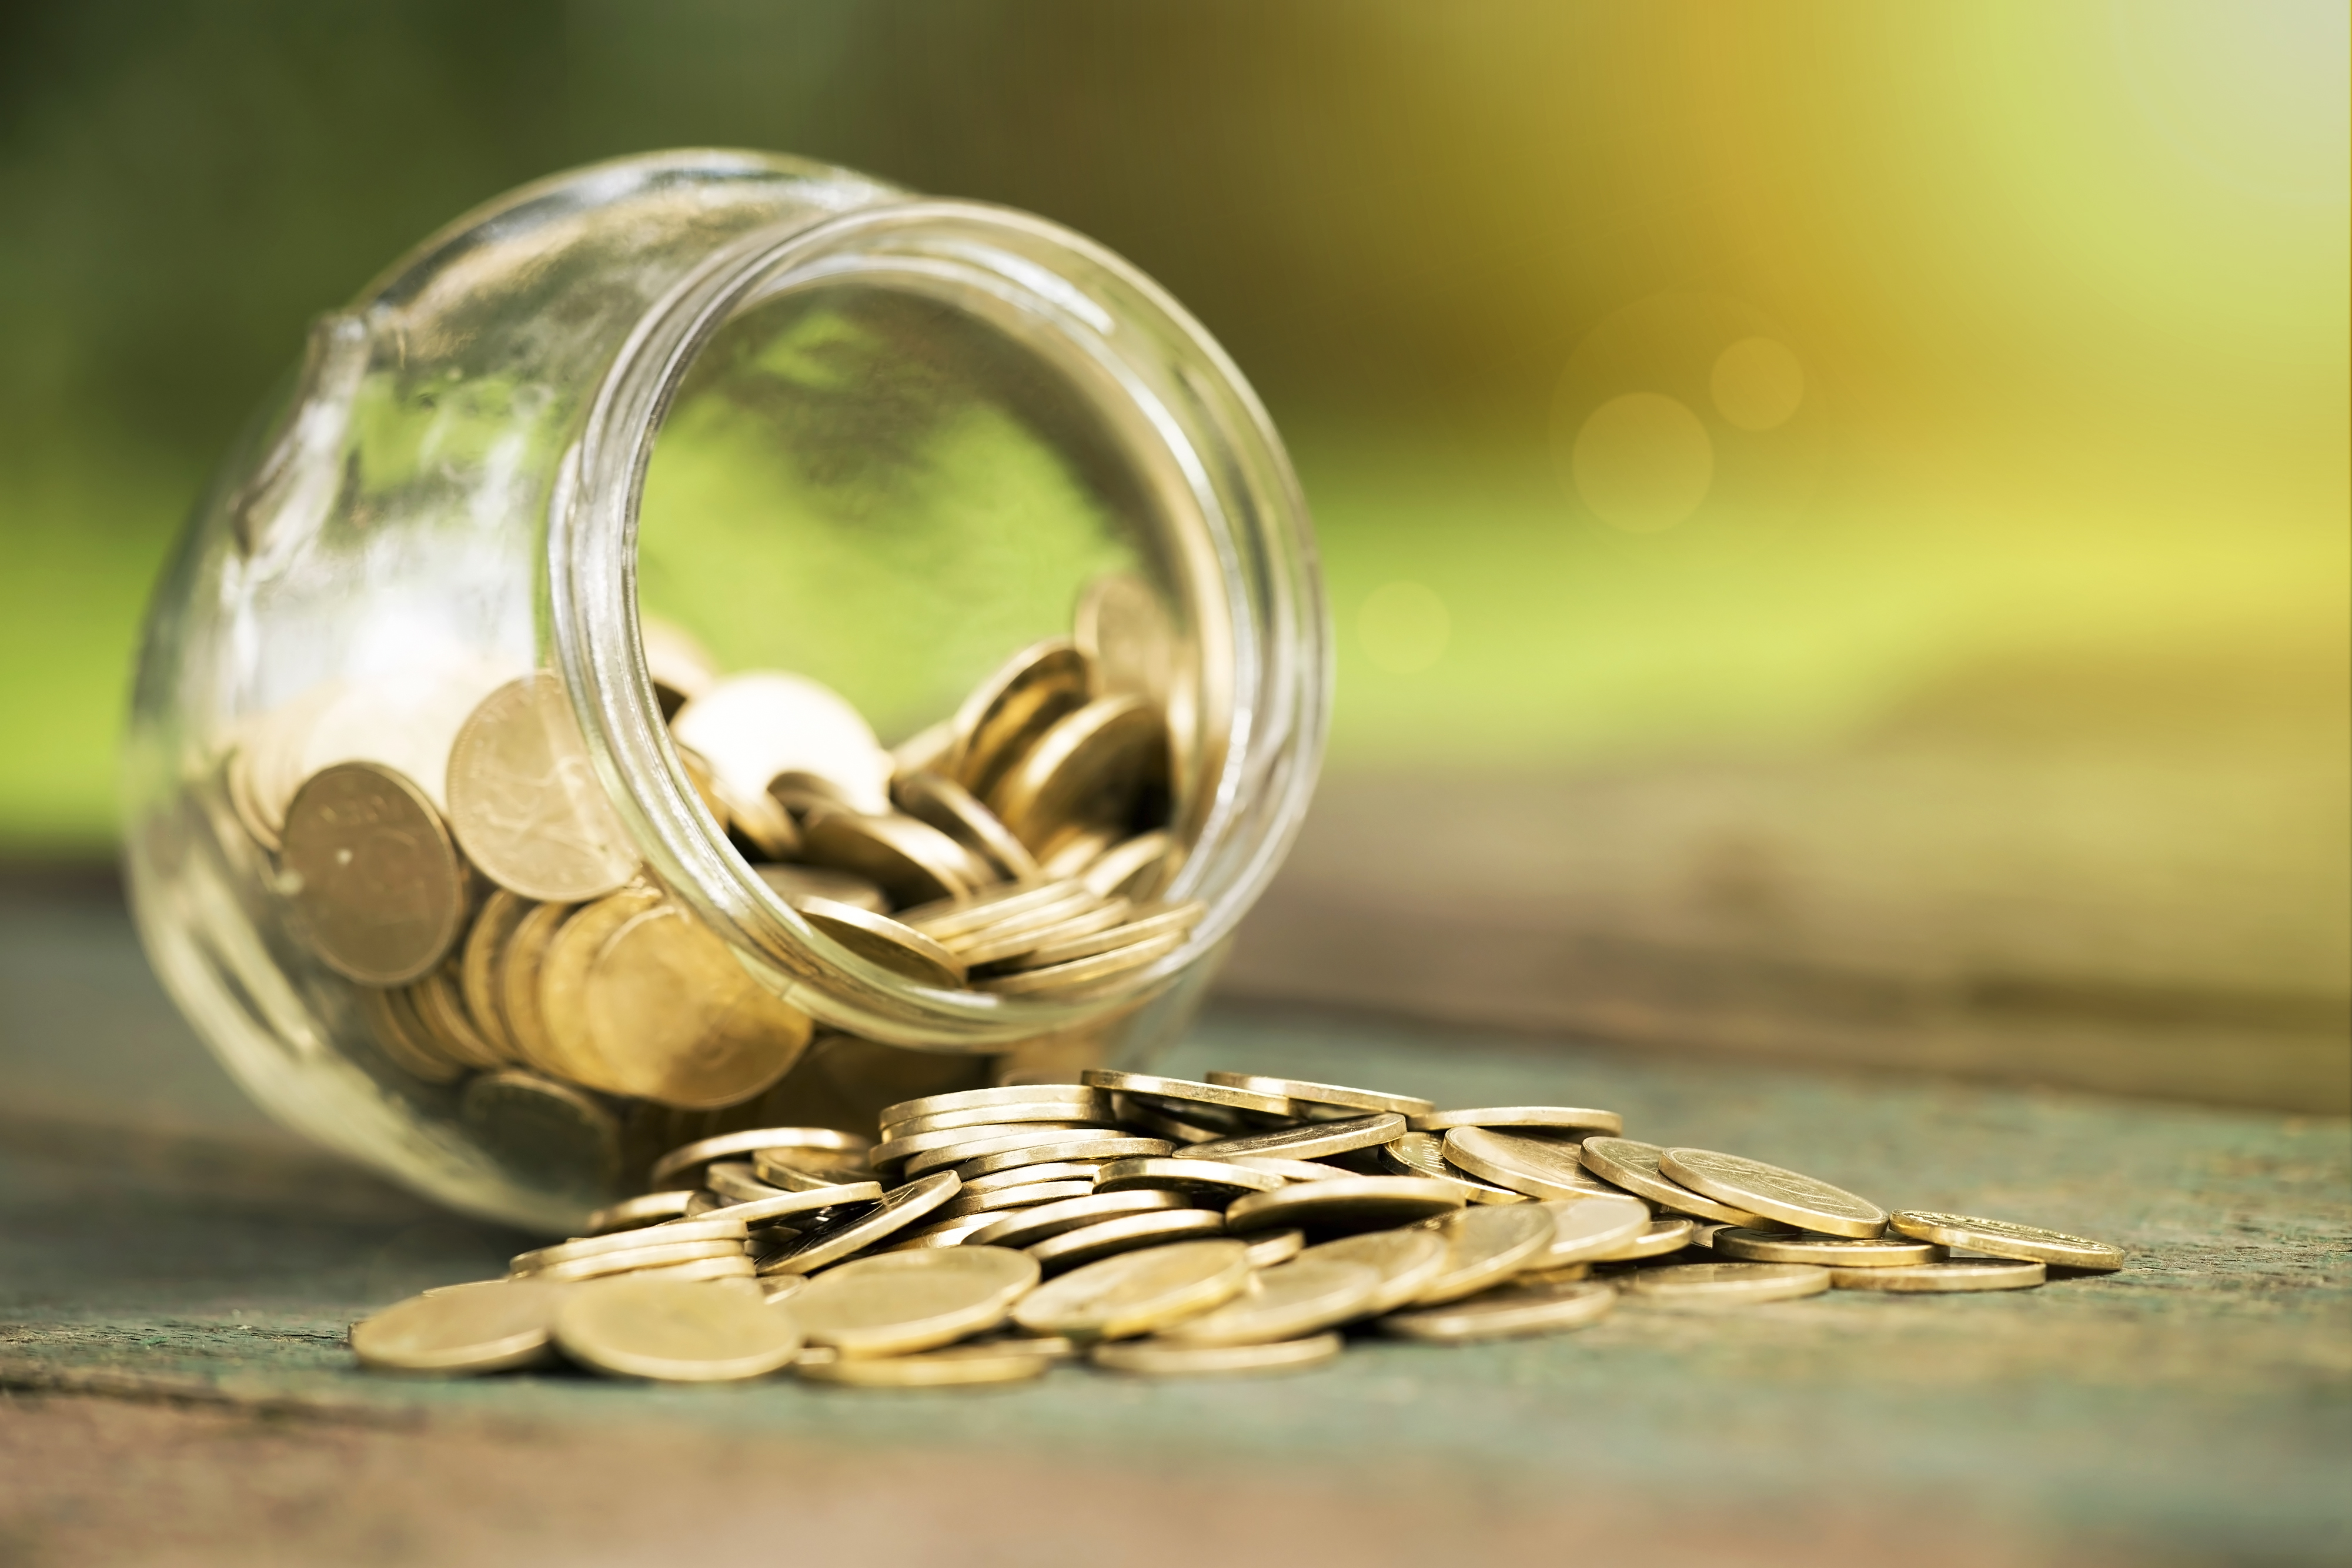 Cash converters loans glenroy picture 5